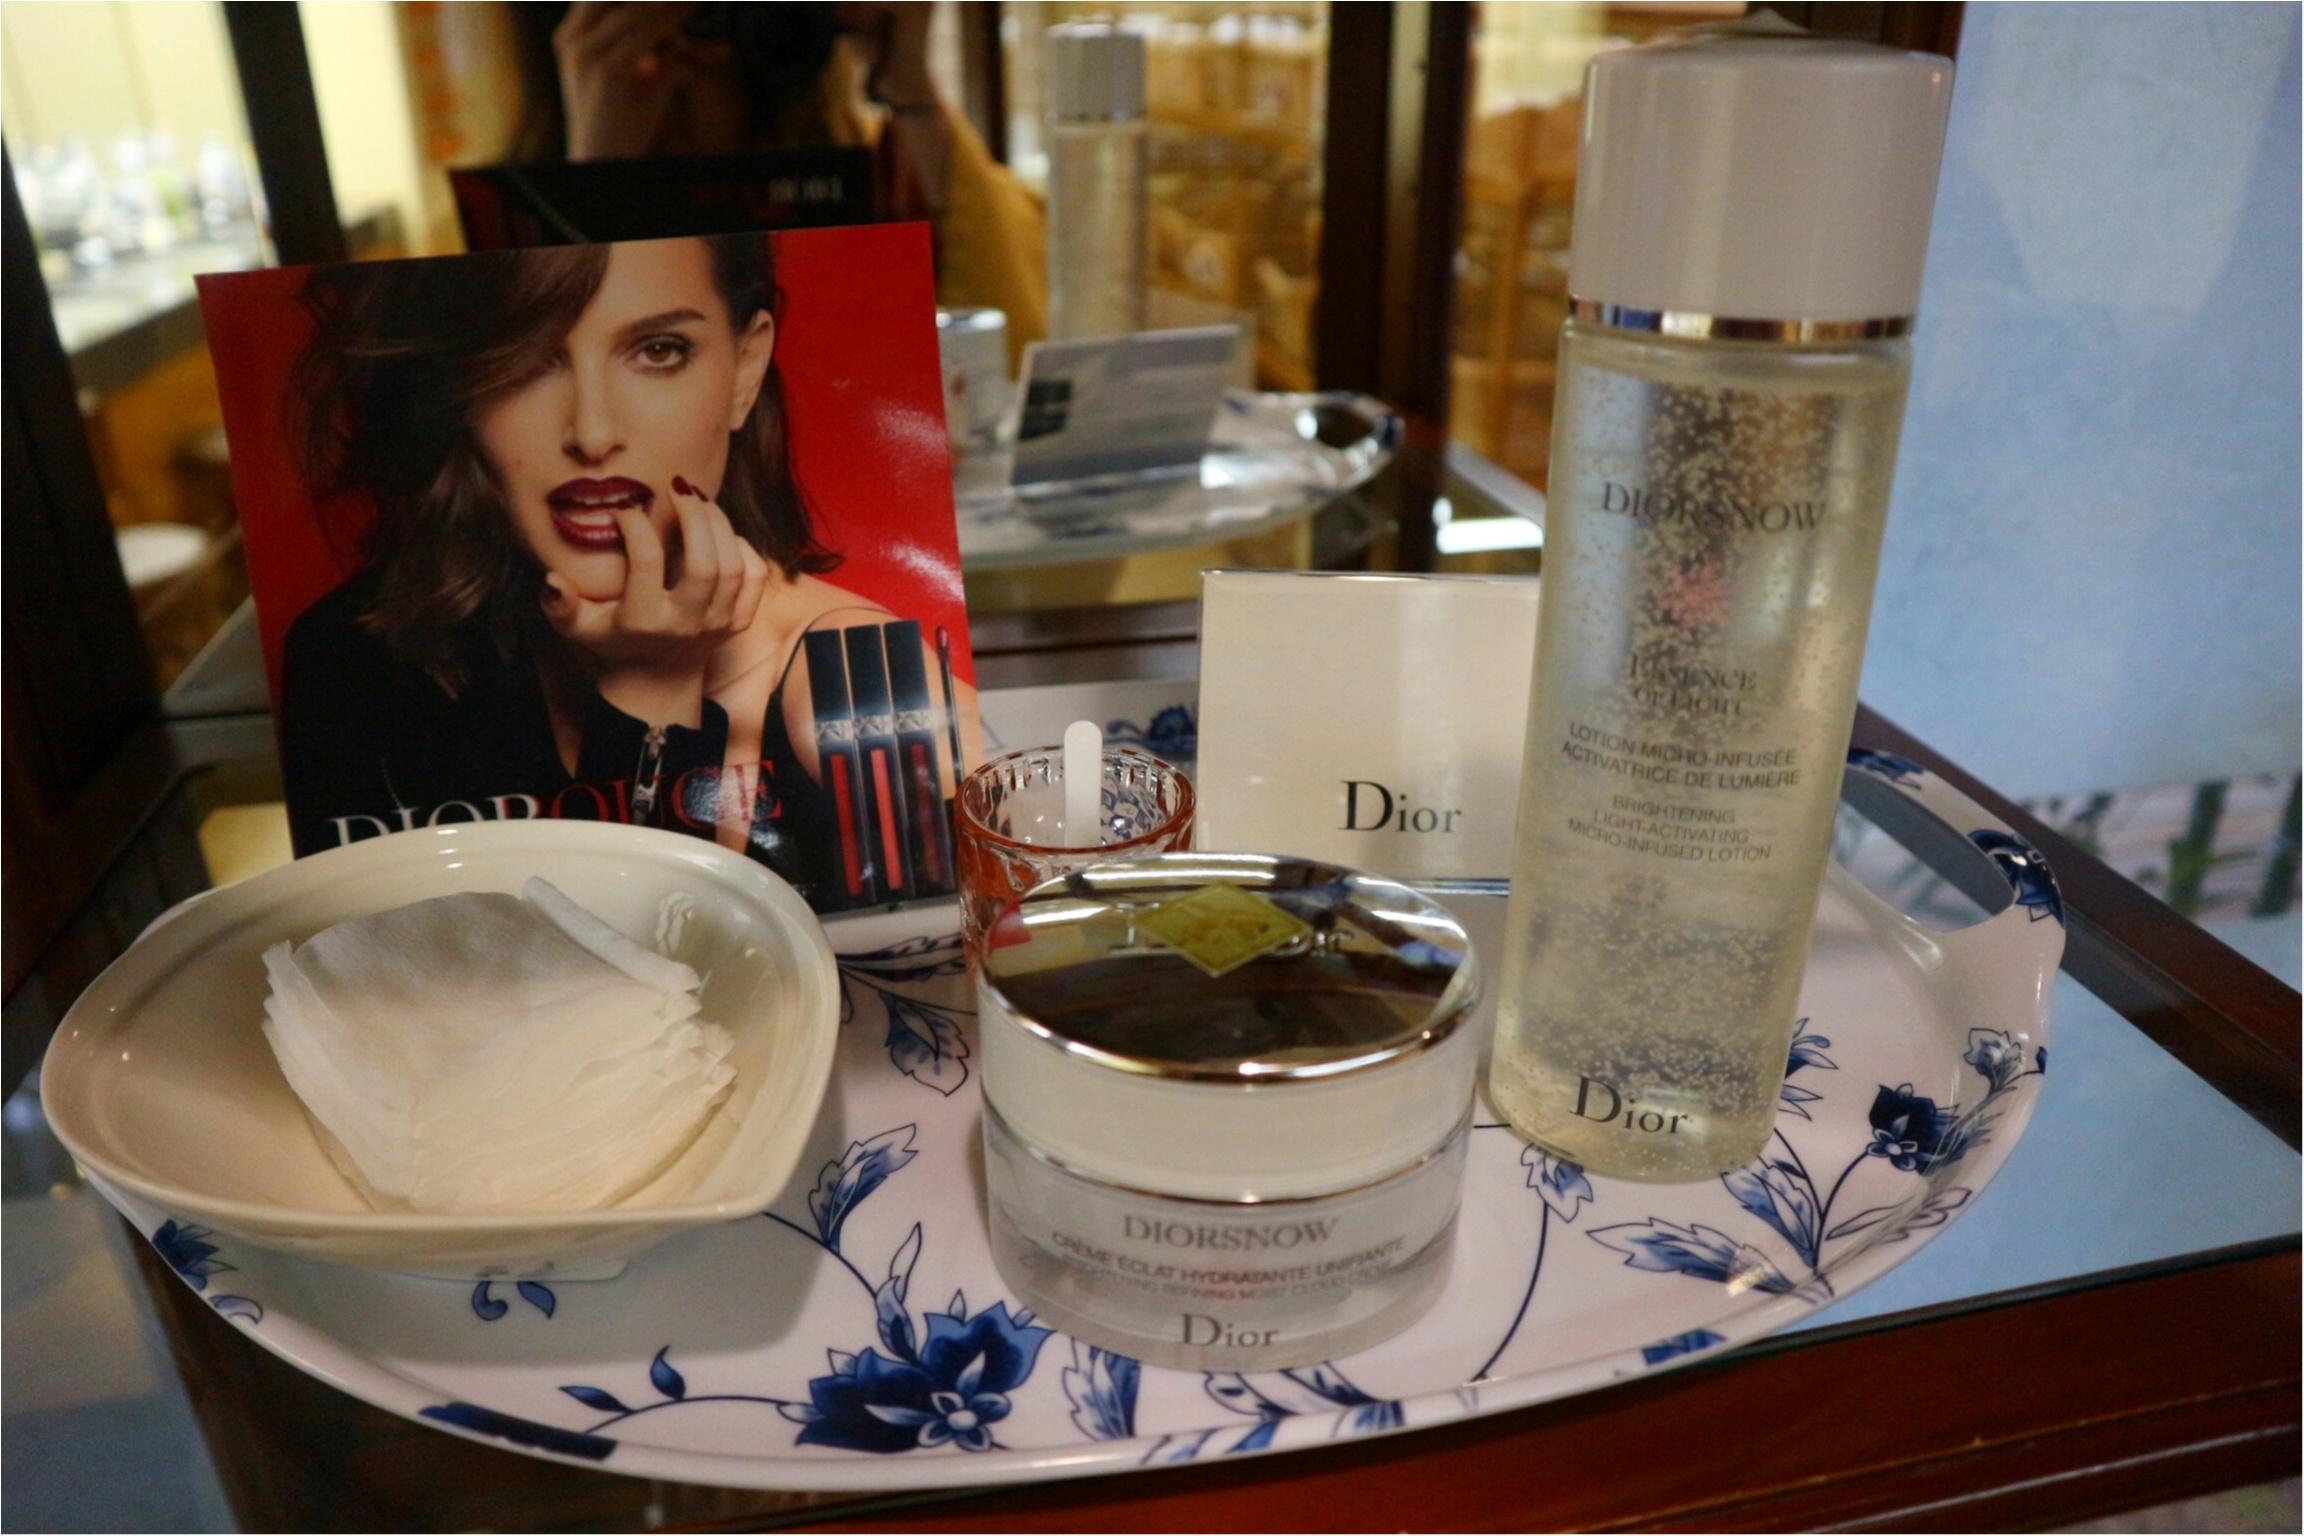 Diorやジョンマスターの化粧品やシャンプーが使い放題♡絶対 女子が喜ぶ旅館♡_1